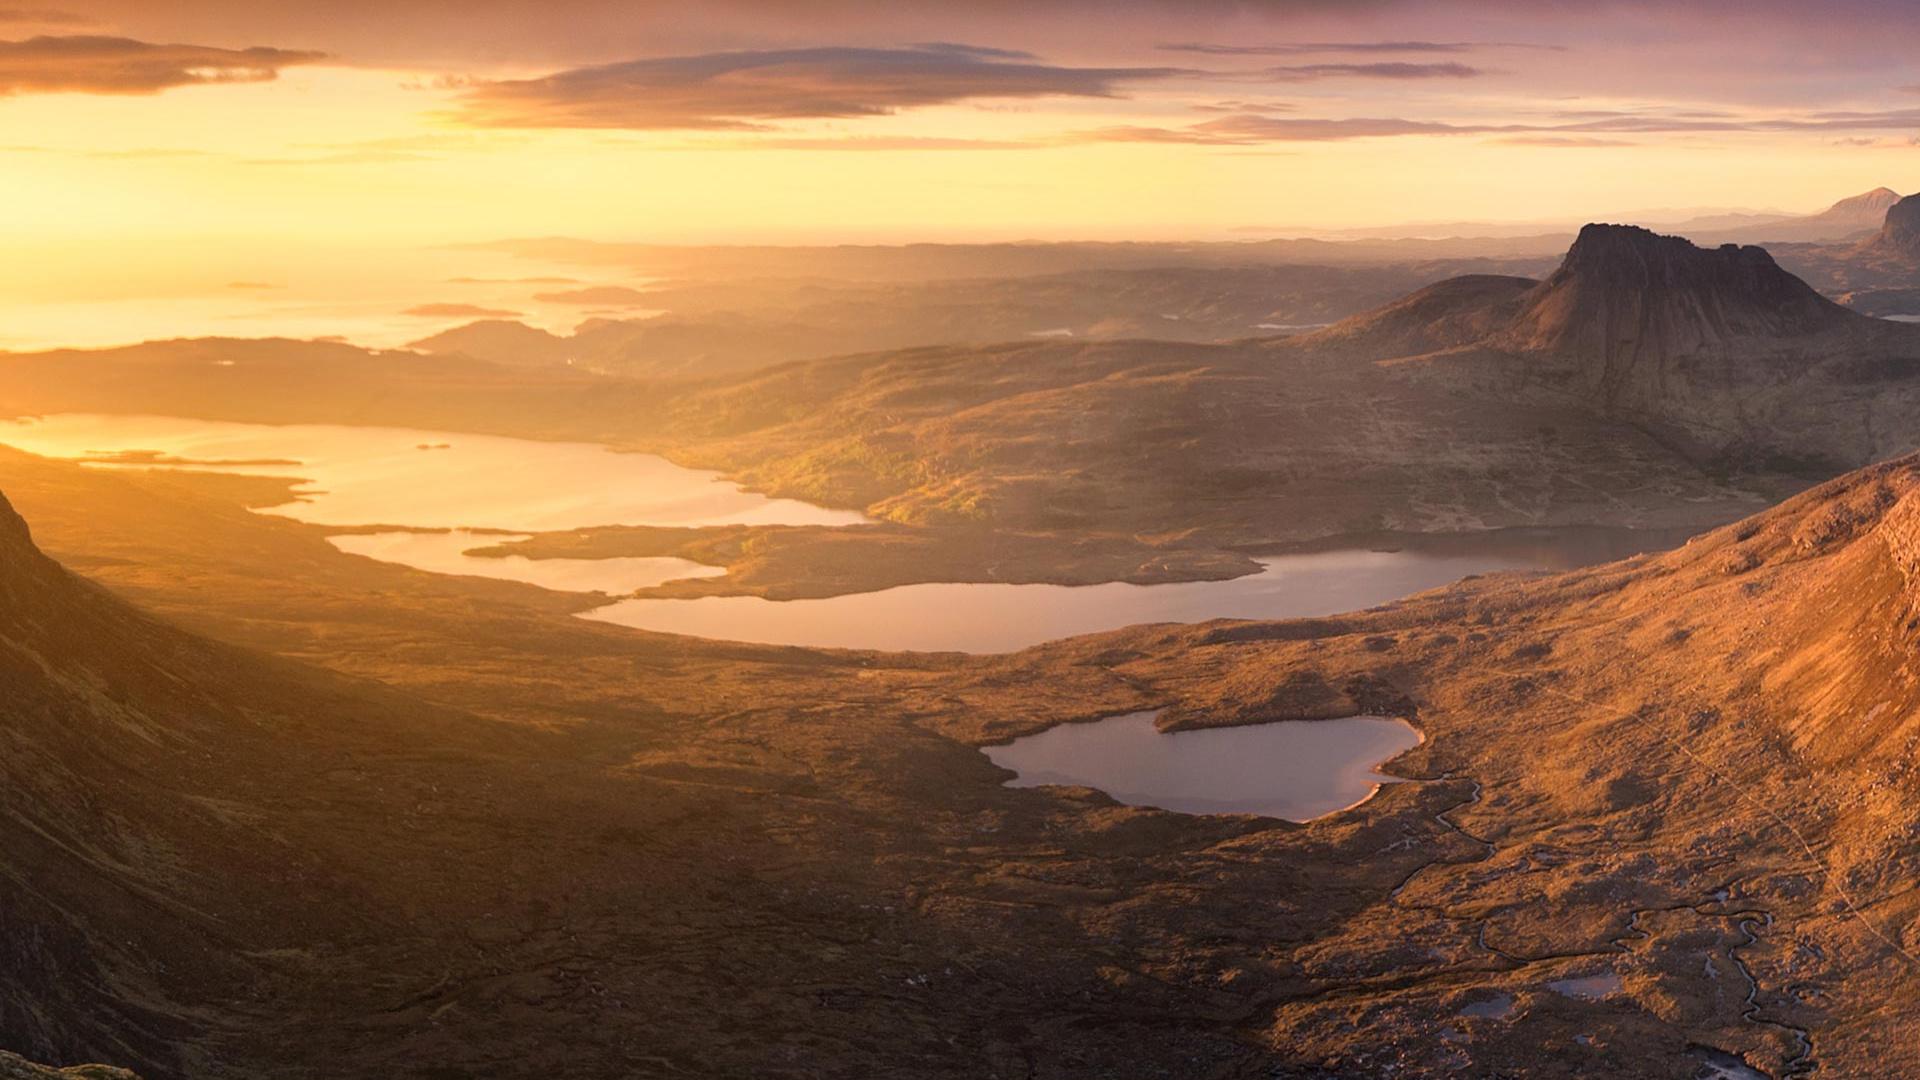 Sgurr an Fhidleir, Northwest of Ullapool, Scotland. Photograph by Sebastian Kraus